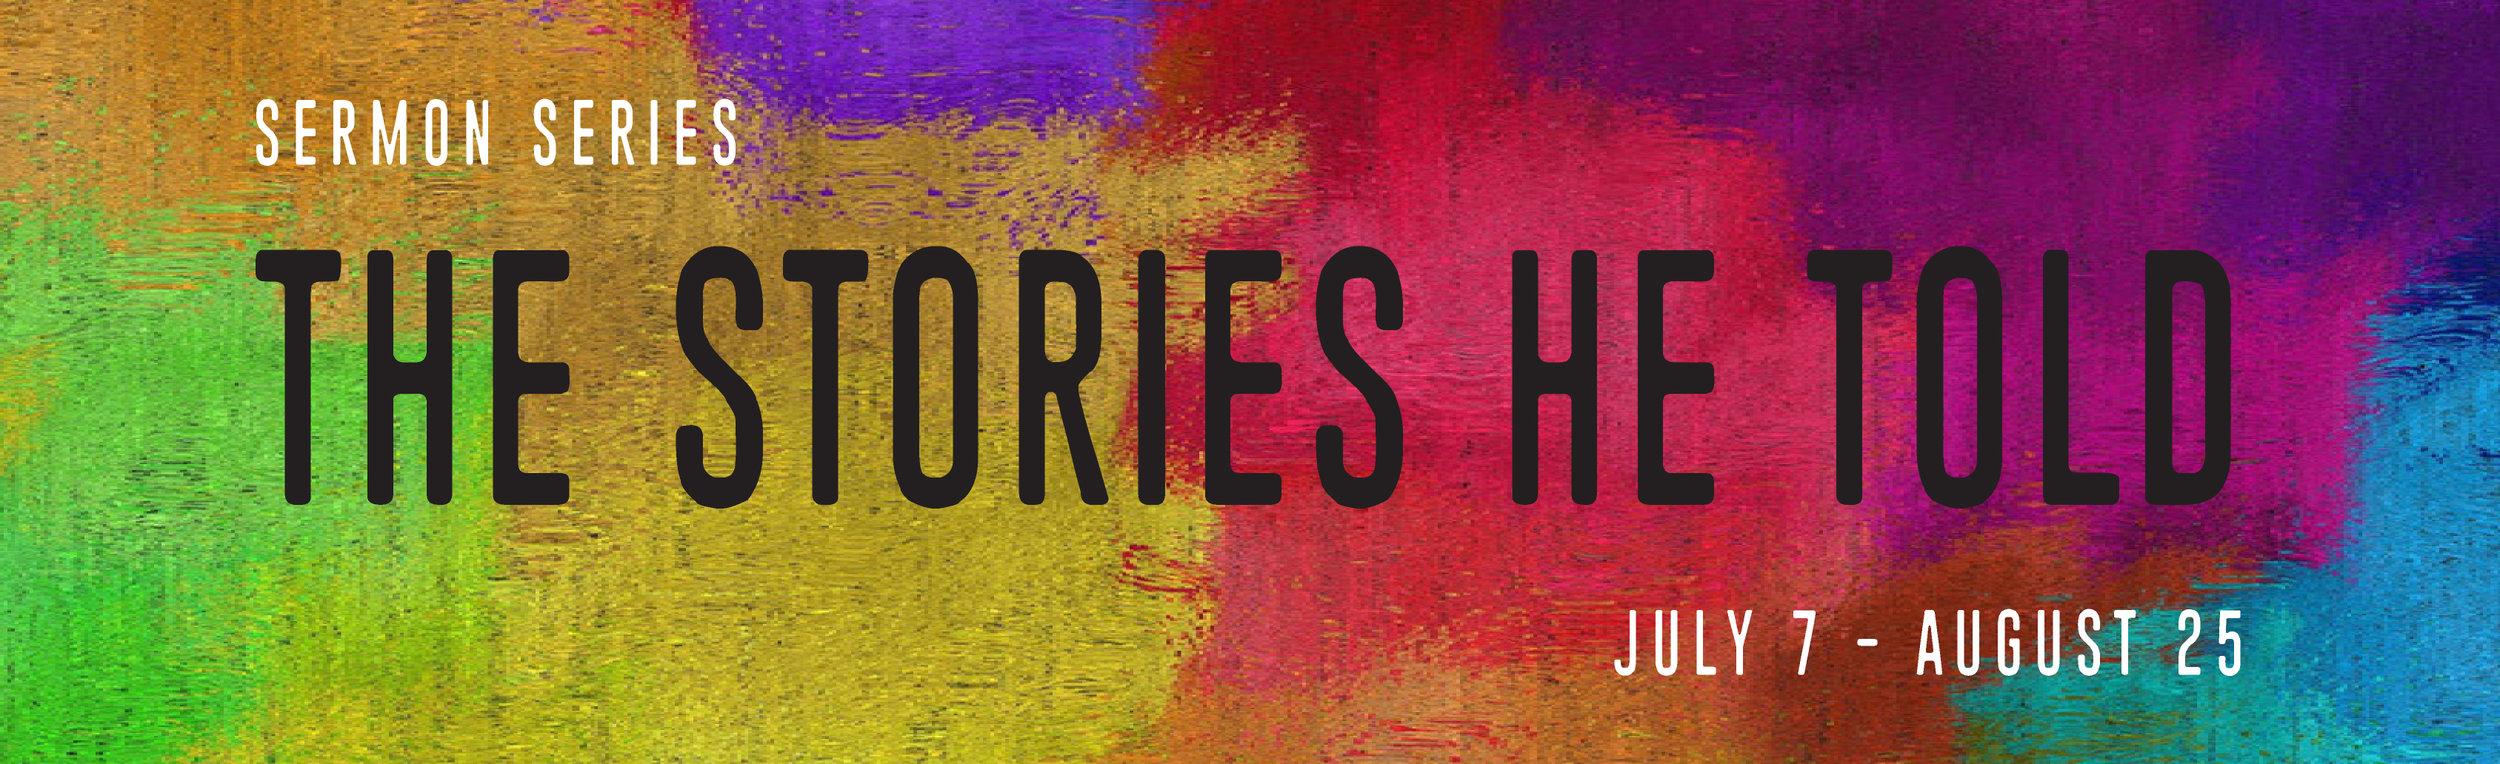 Stories_web-banner.jpg